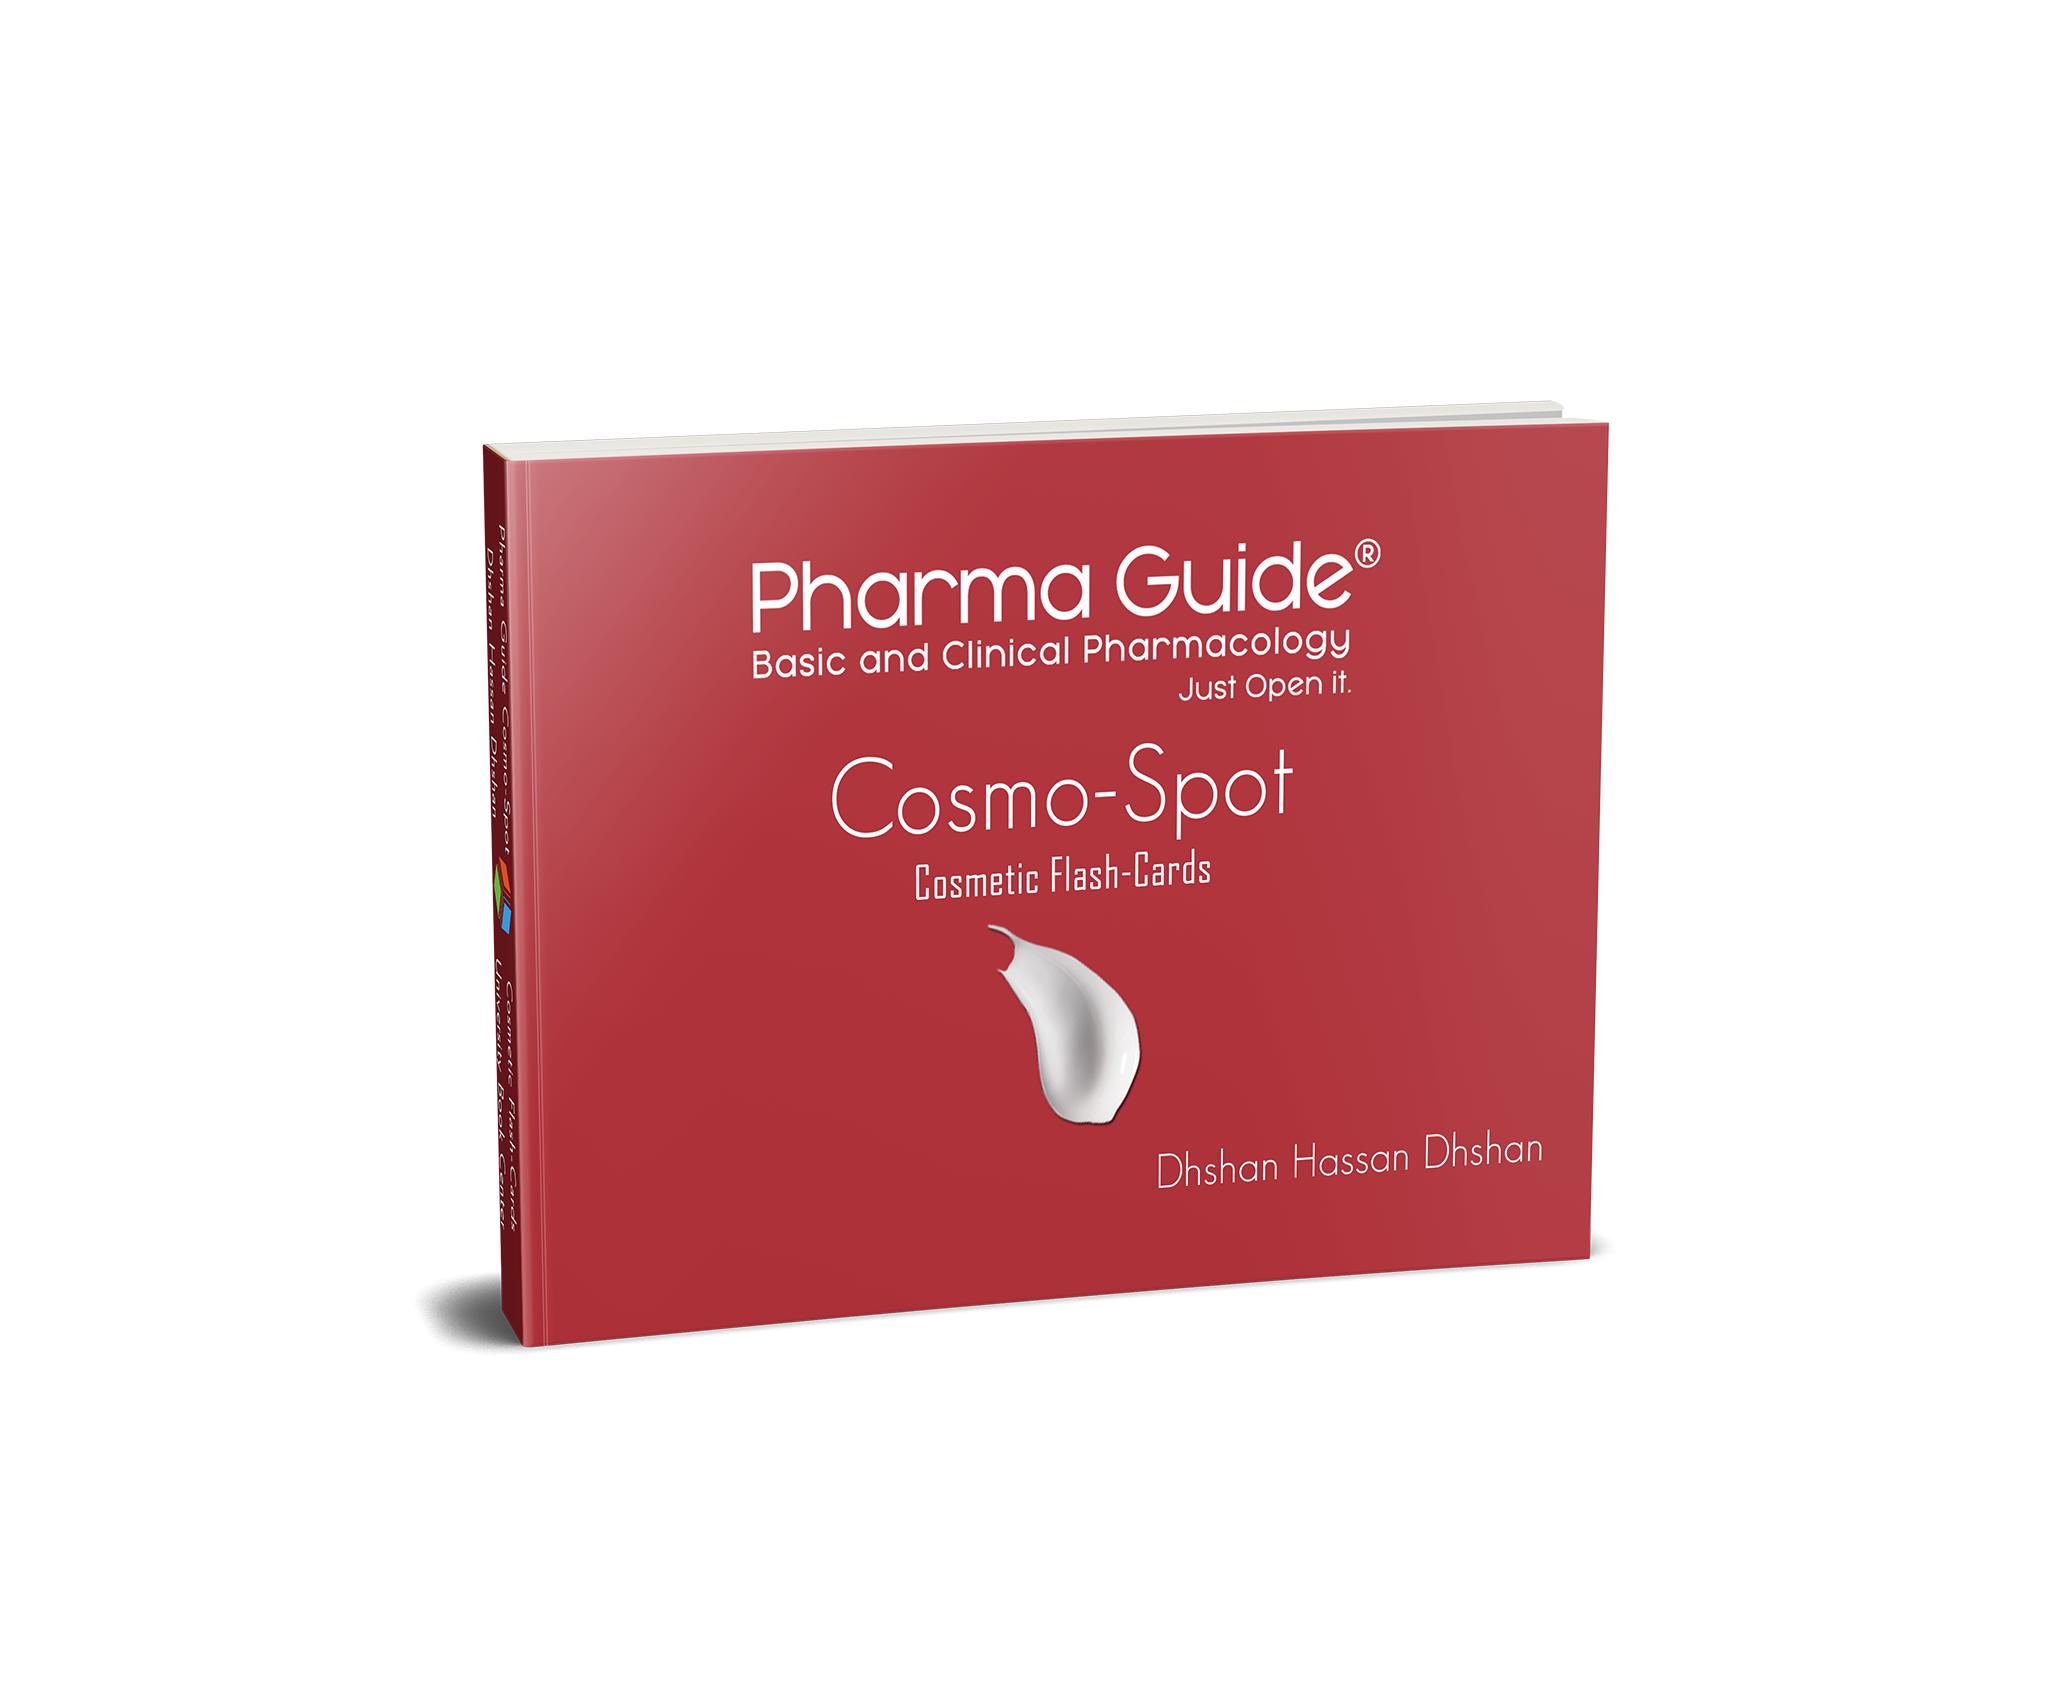 تحميل كتاب pharma guide pre work